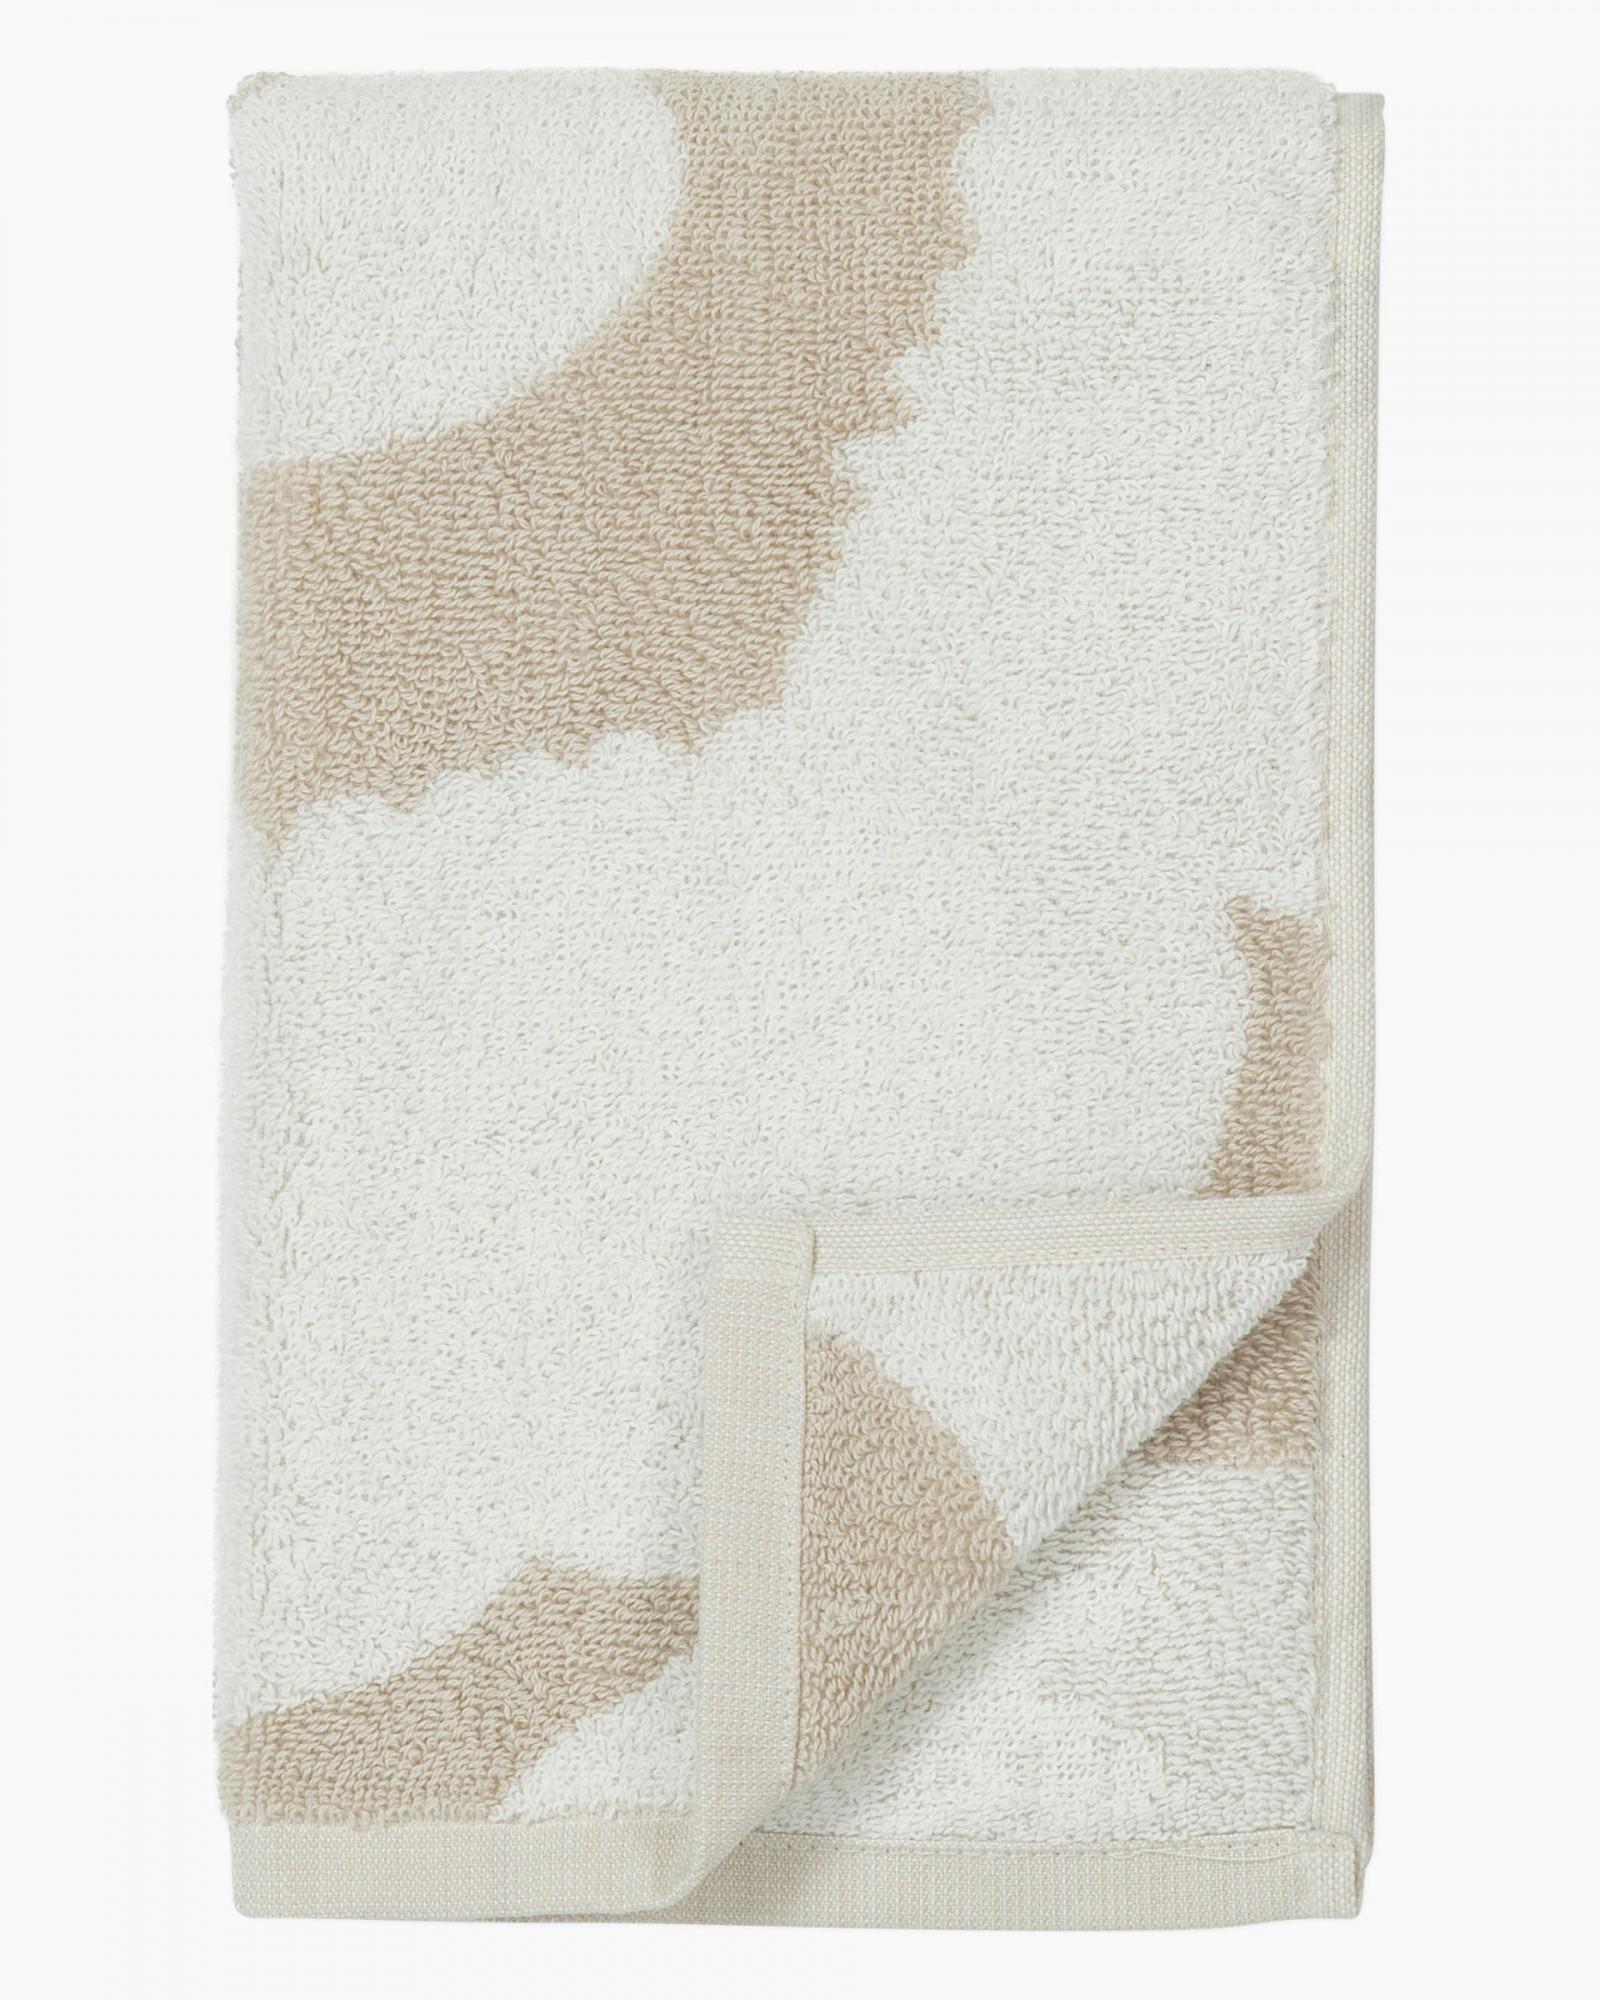 Serviette invité 30x50 cm Unikko beige * Marimekko